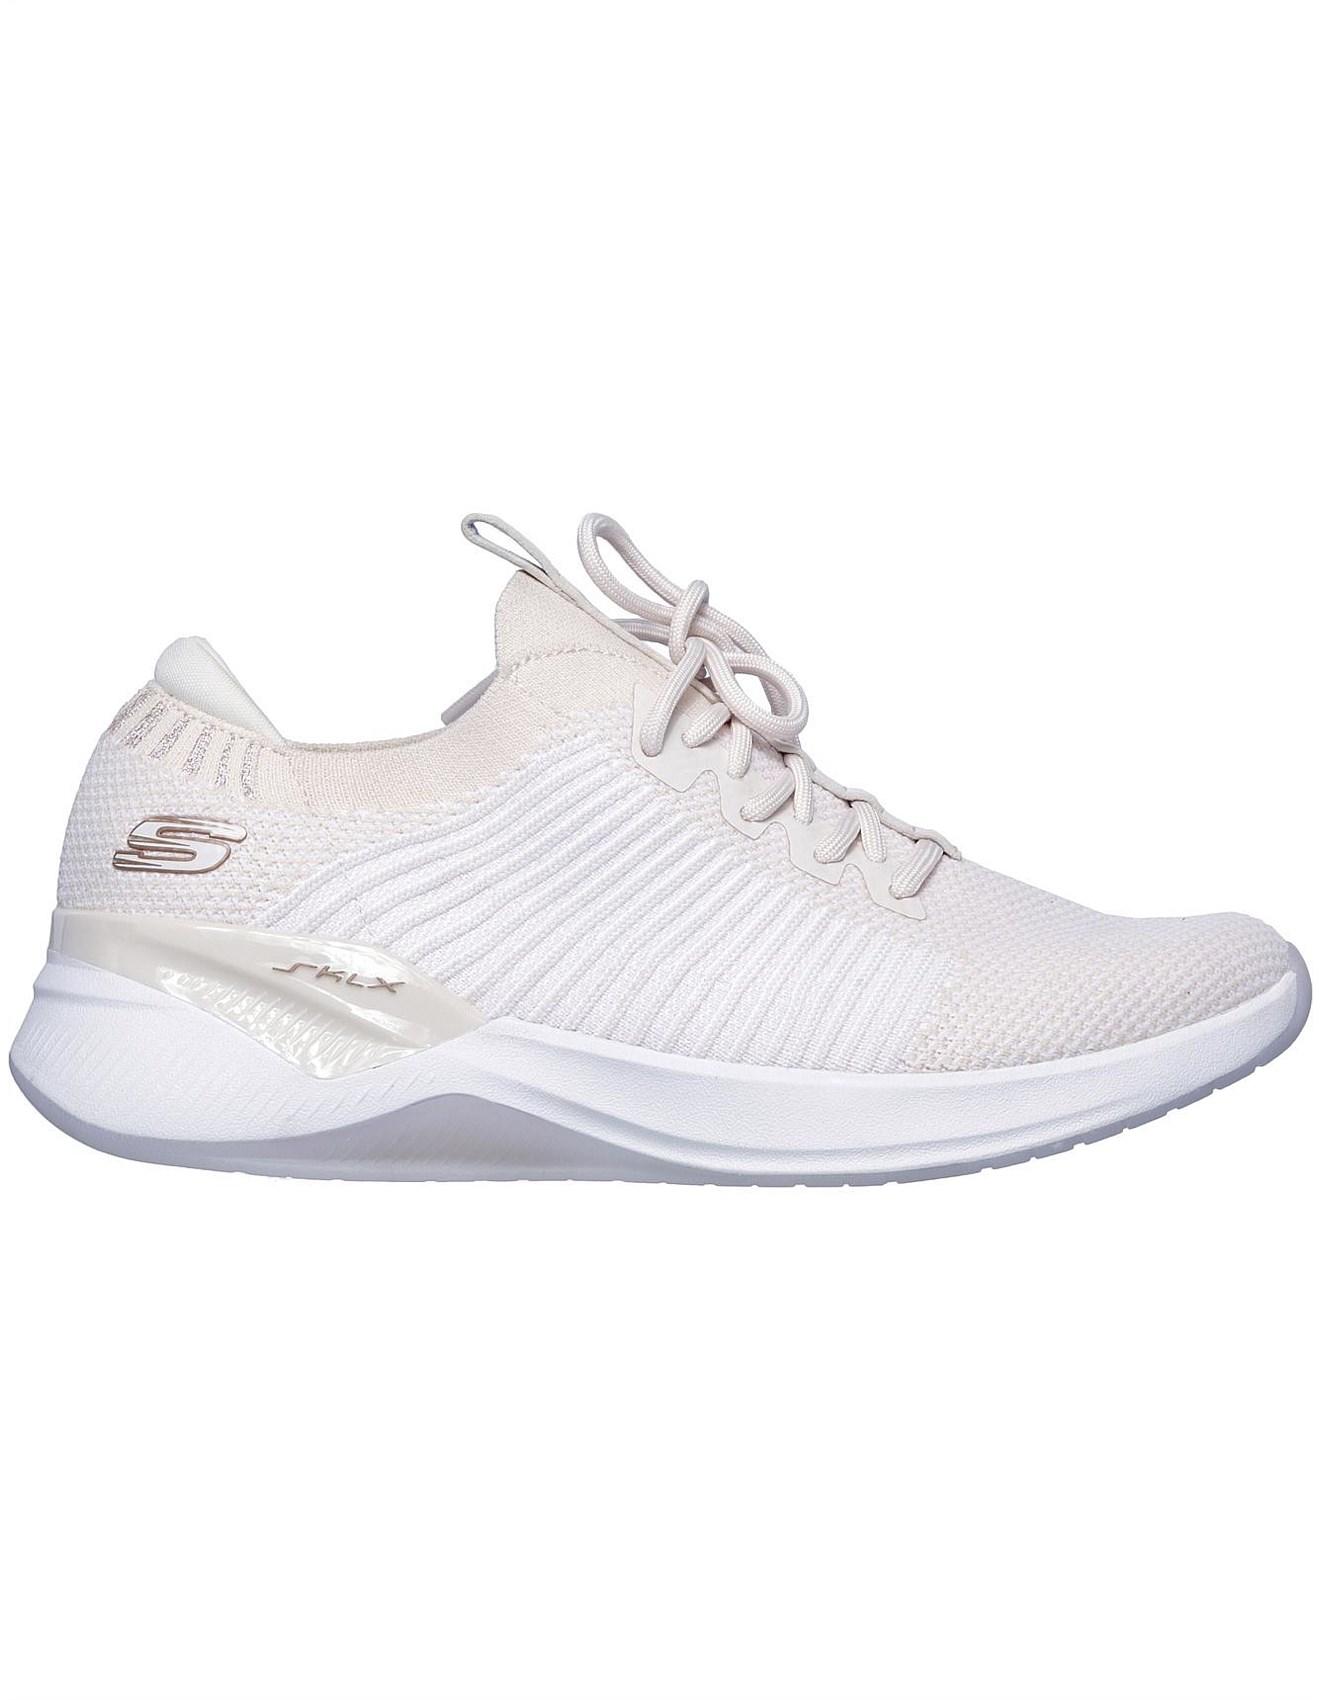 skechers shoes australia buy online